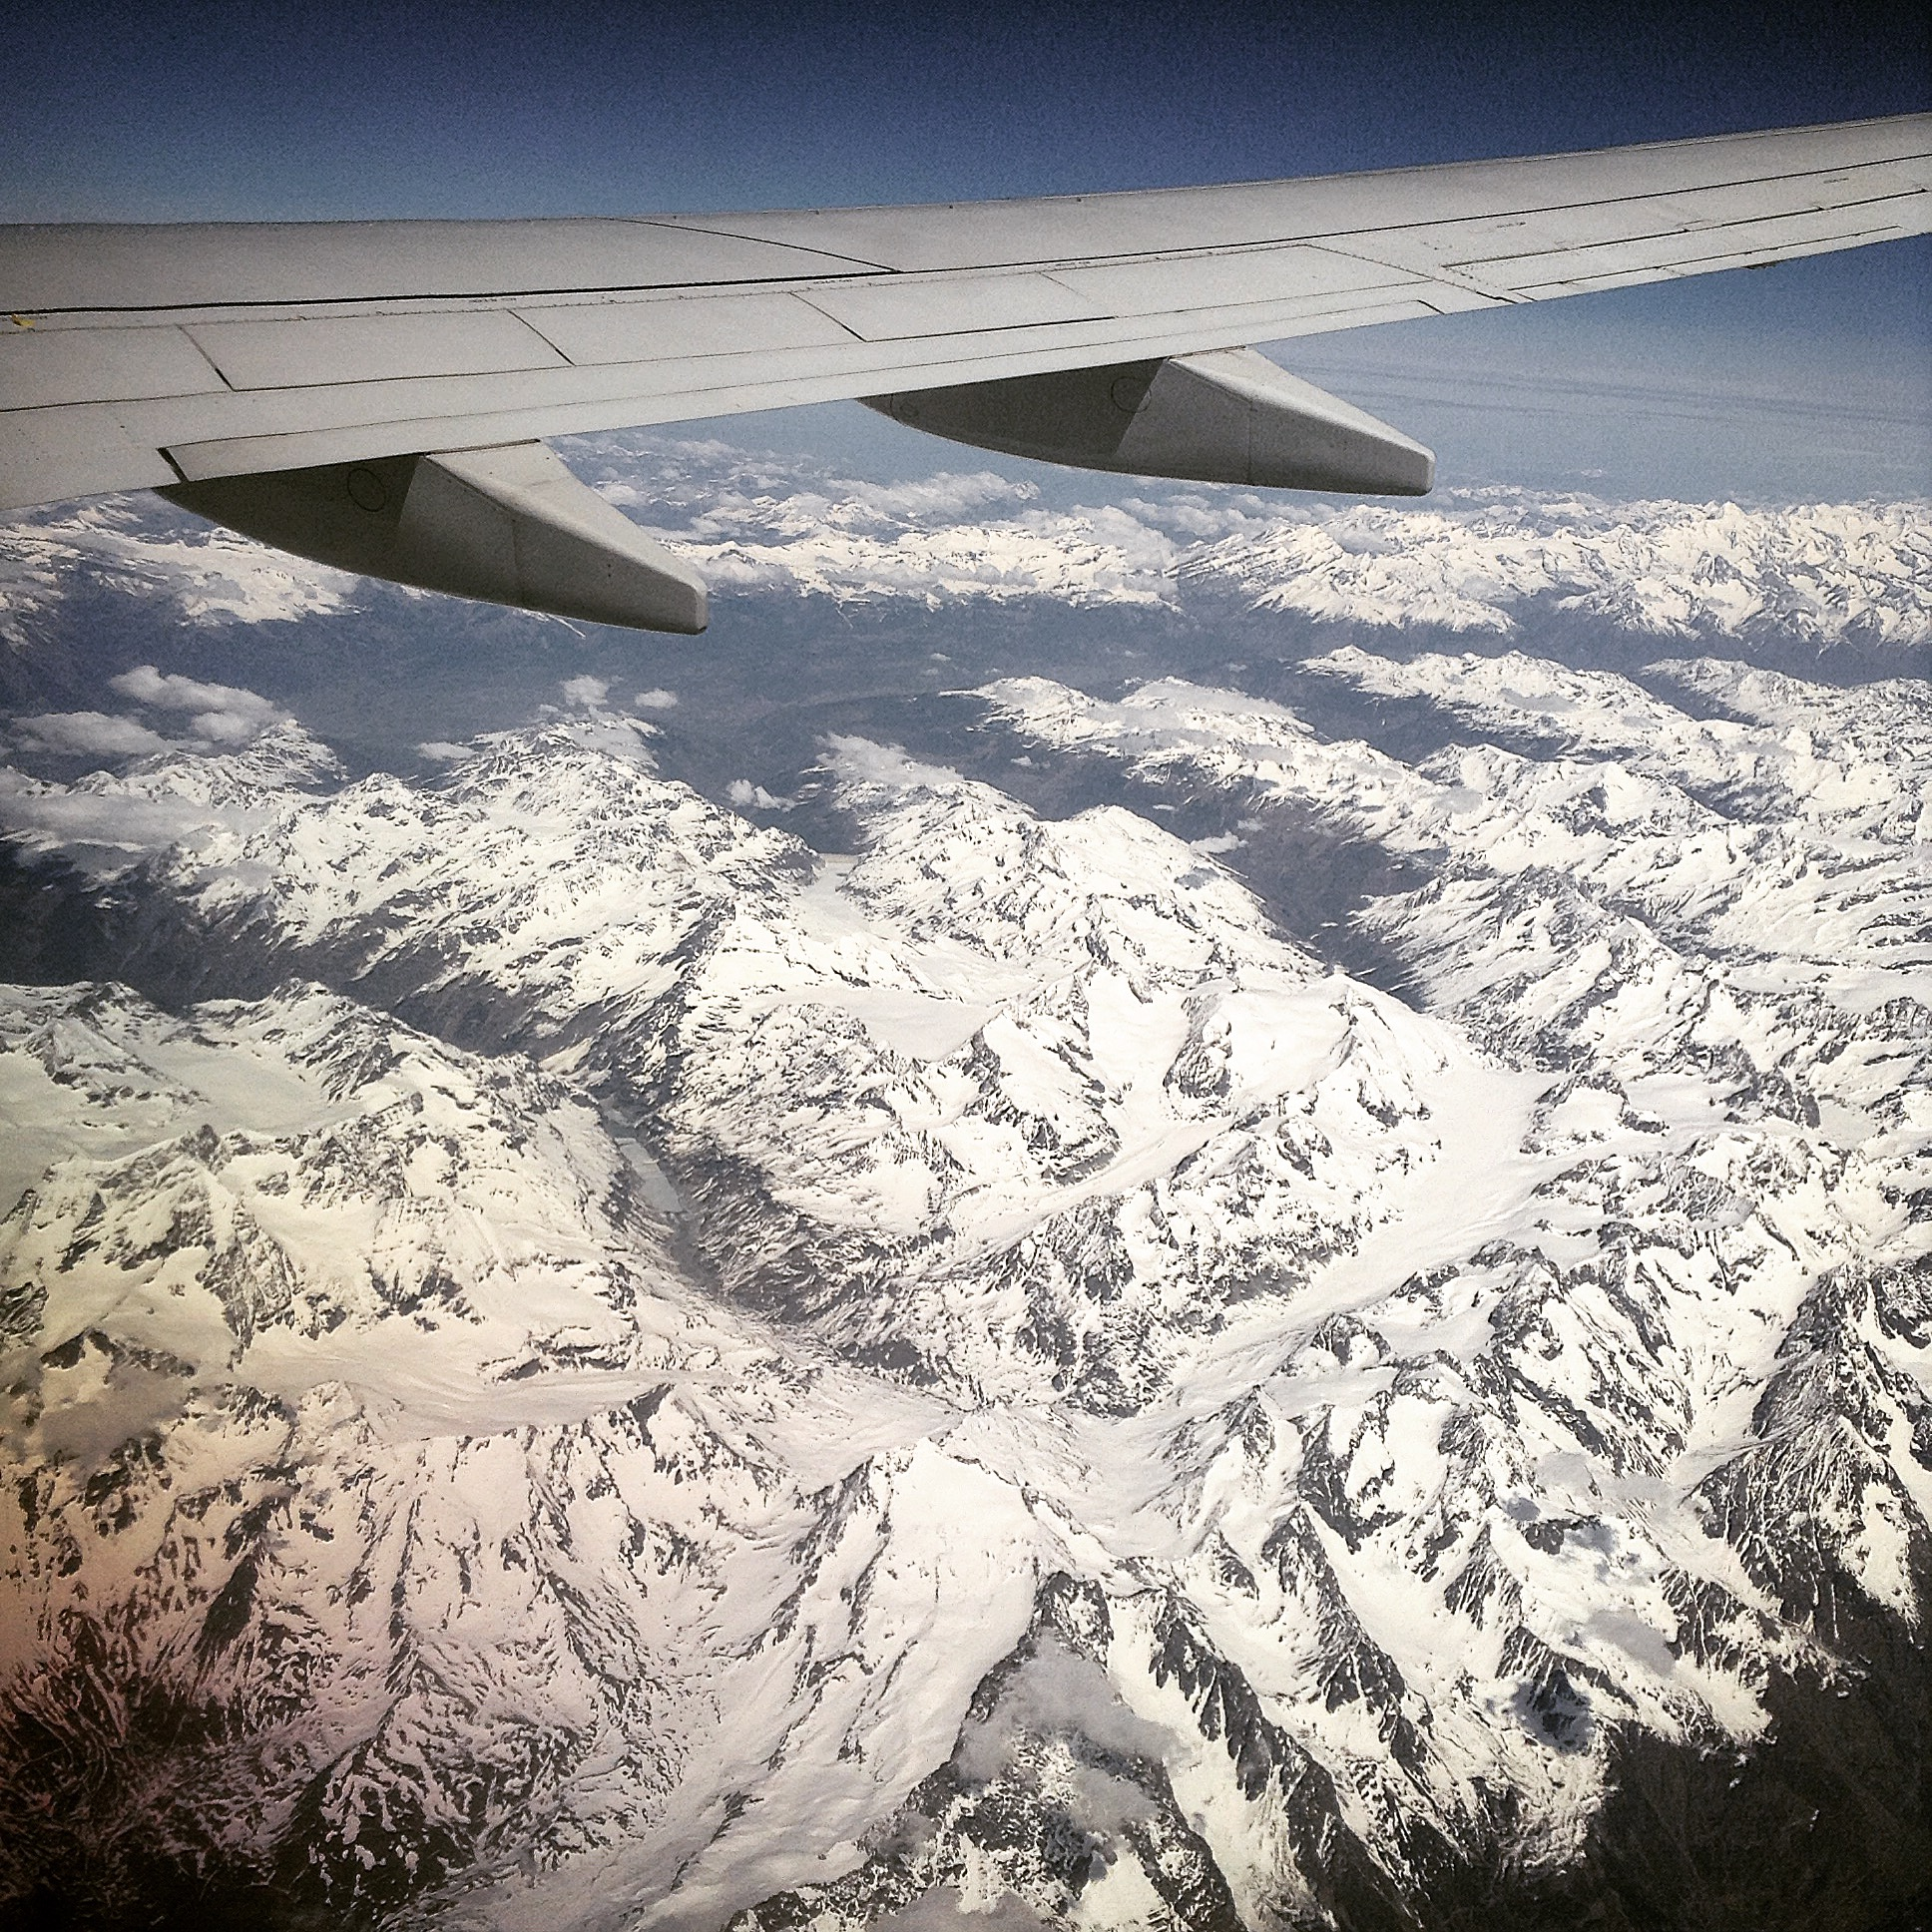 Flight over The Alps